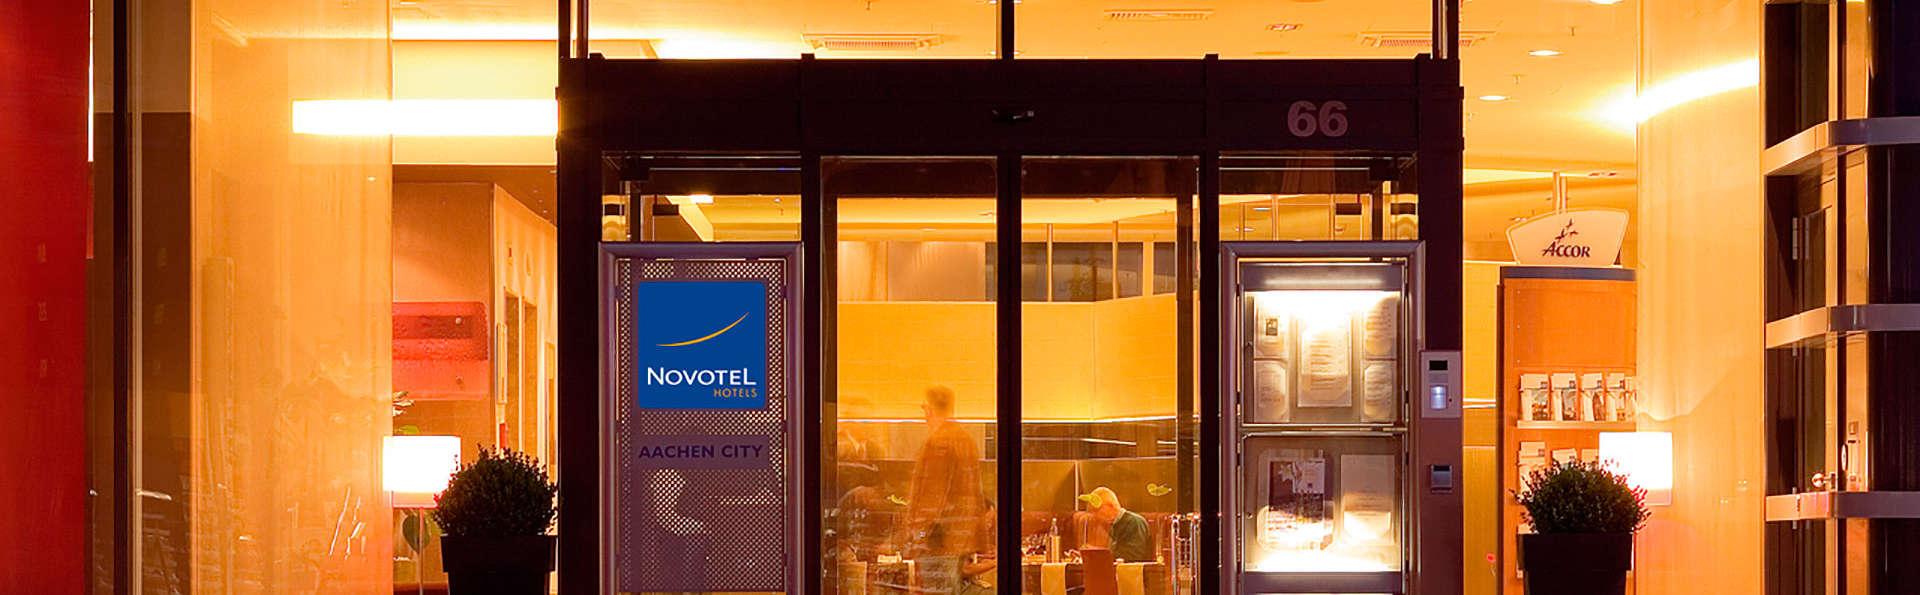 Novotel Aachen City (Aken / Aix-la-Chapelle) - EDIT_entry.jpg